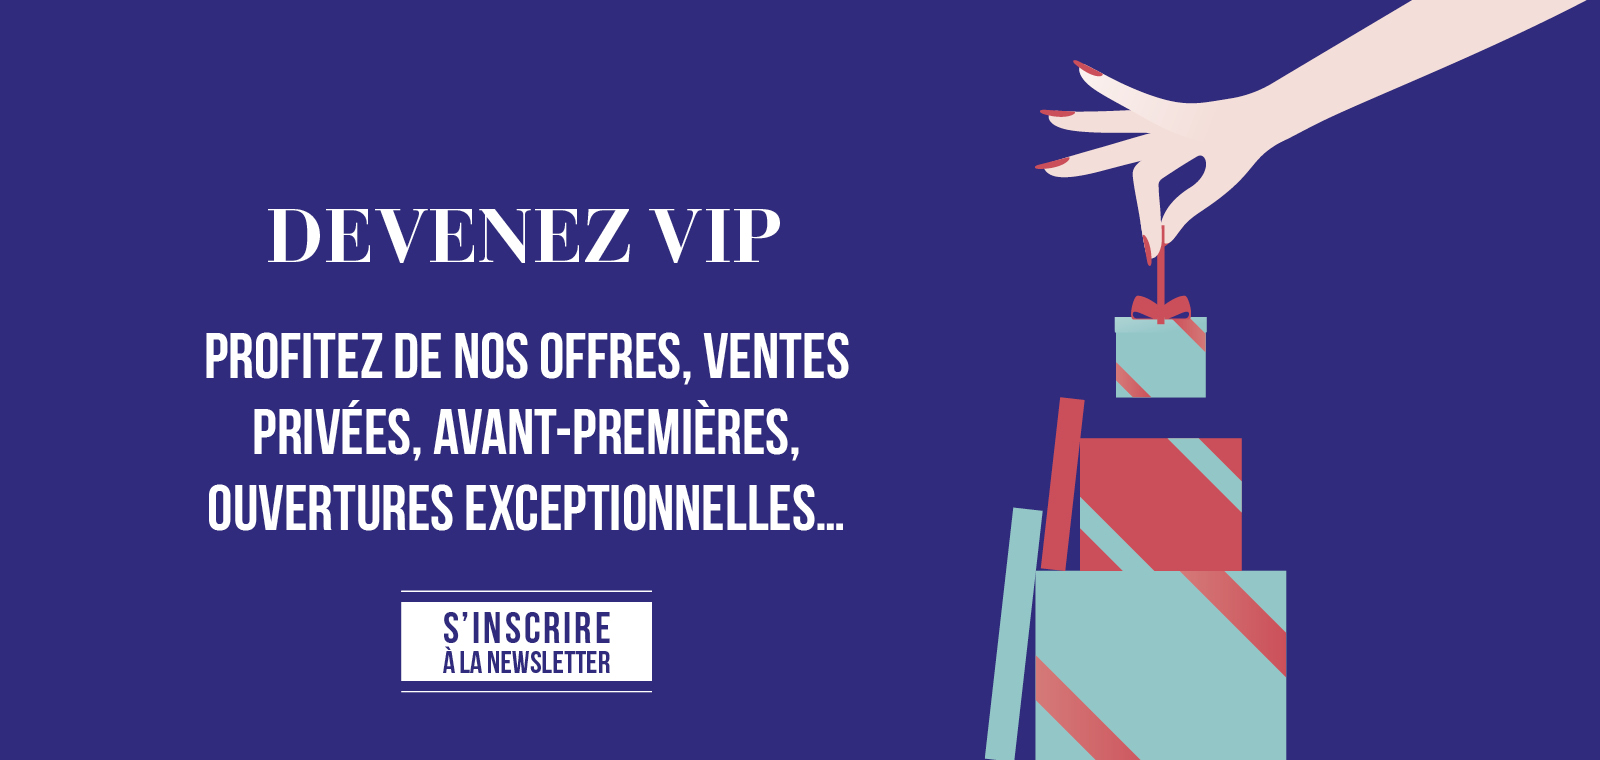 Devenez VIP (2018)